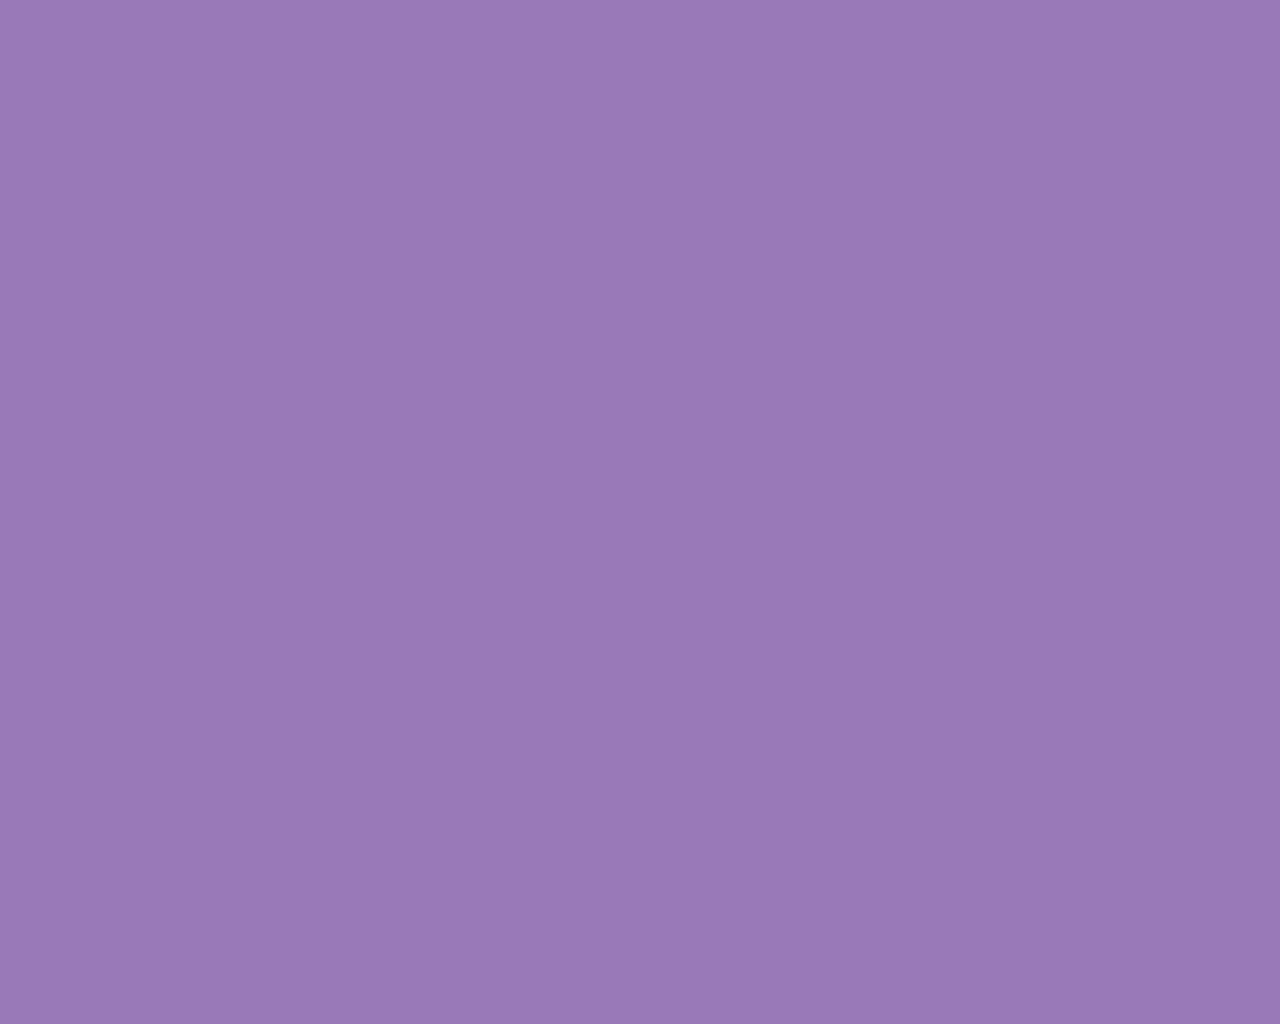 1280x1024 Lavender Purple Solid Color Background